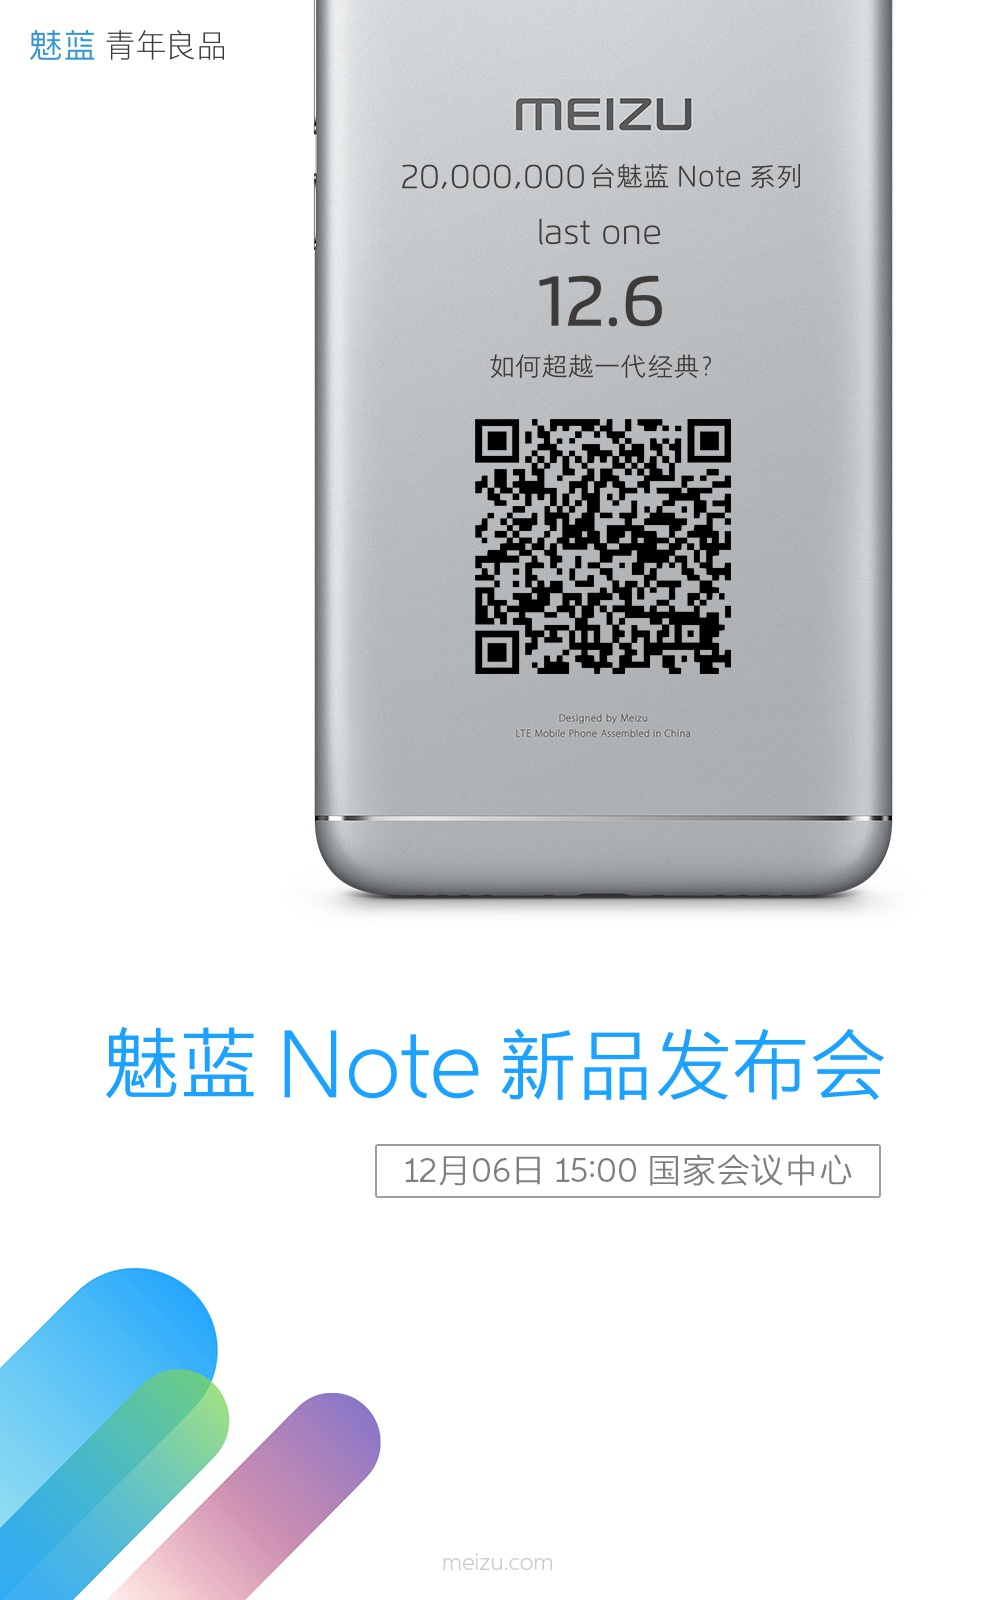 meizu-m5-note-launching-boleh-com